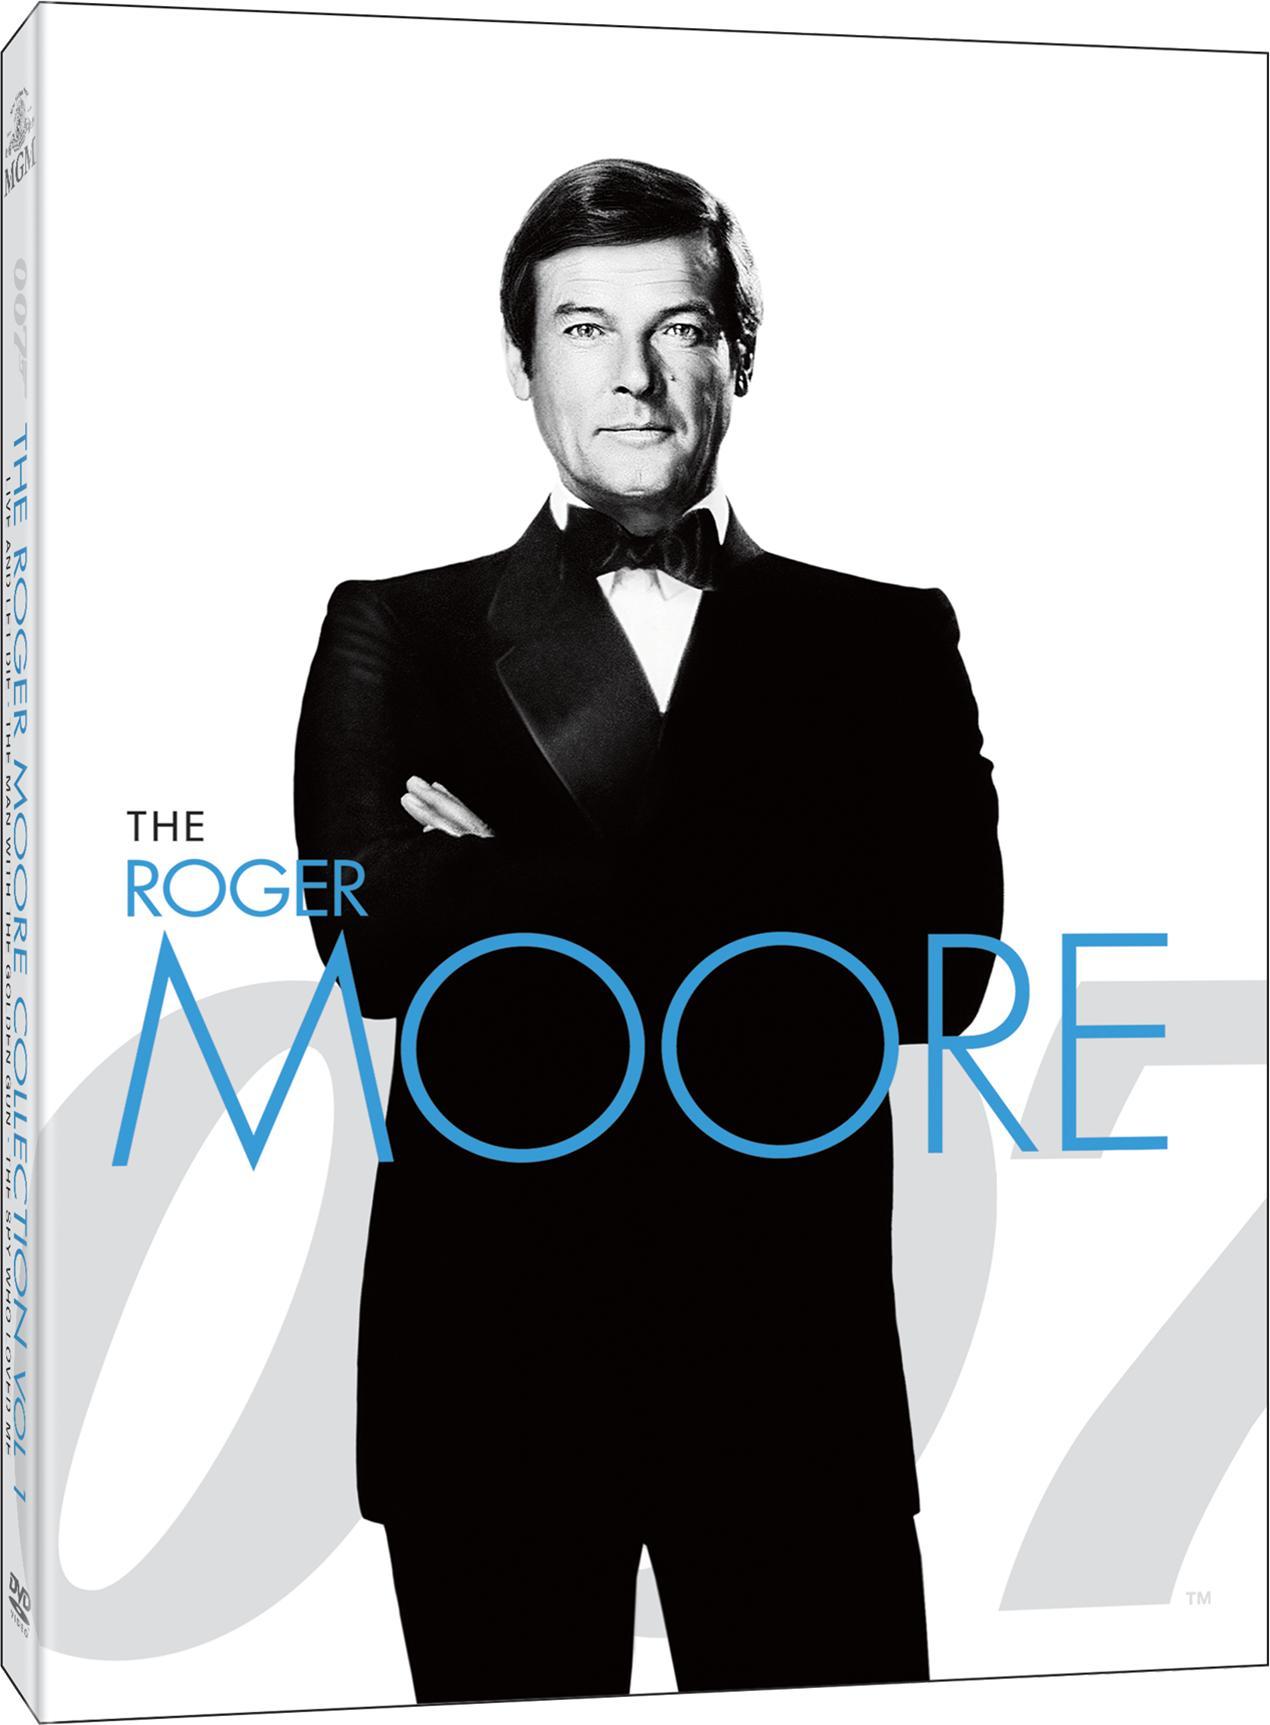 COF.007 JAMES BOND ROGER MOORE COLLECTION (7 DVD) (DVD)